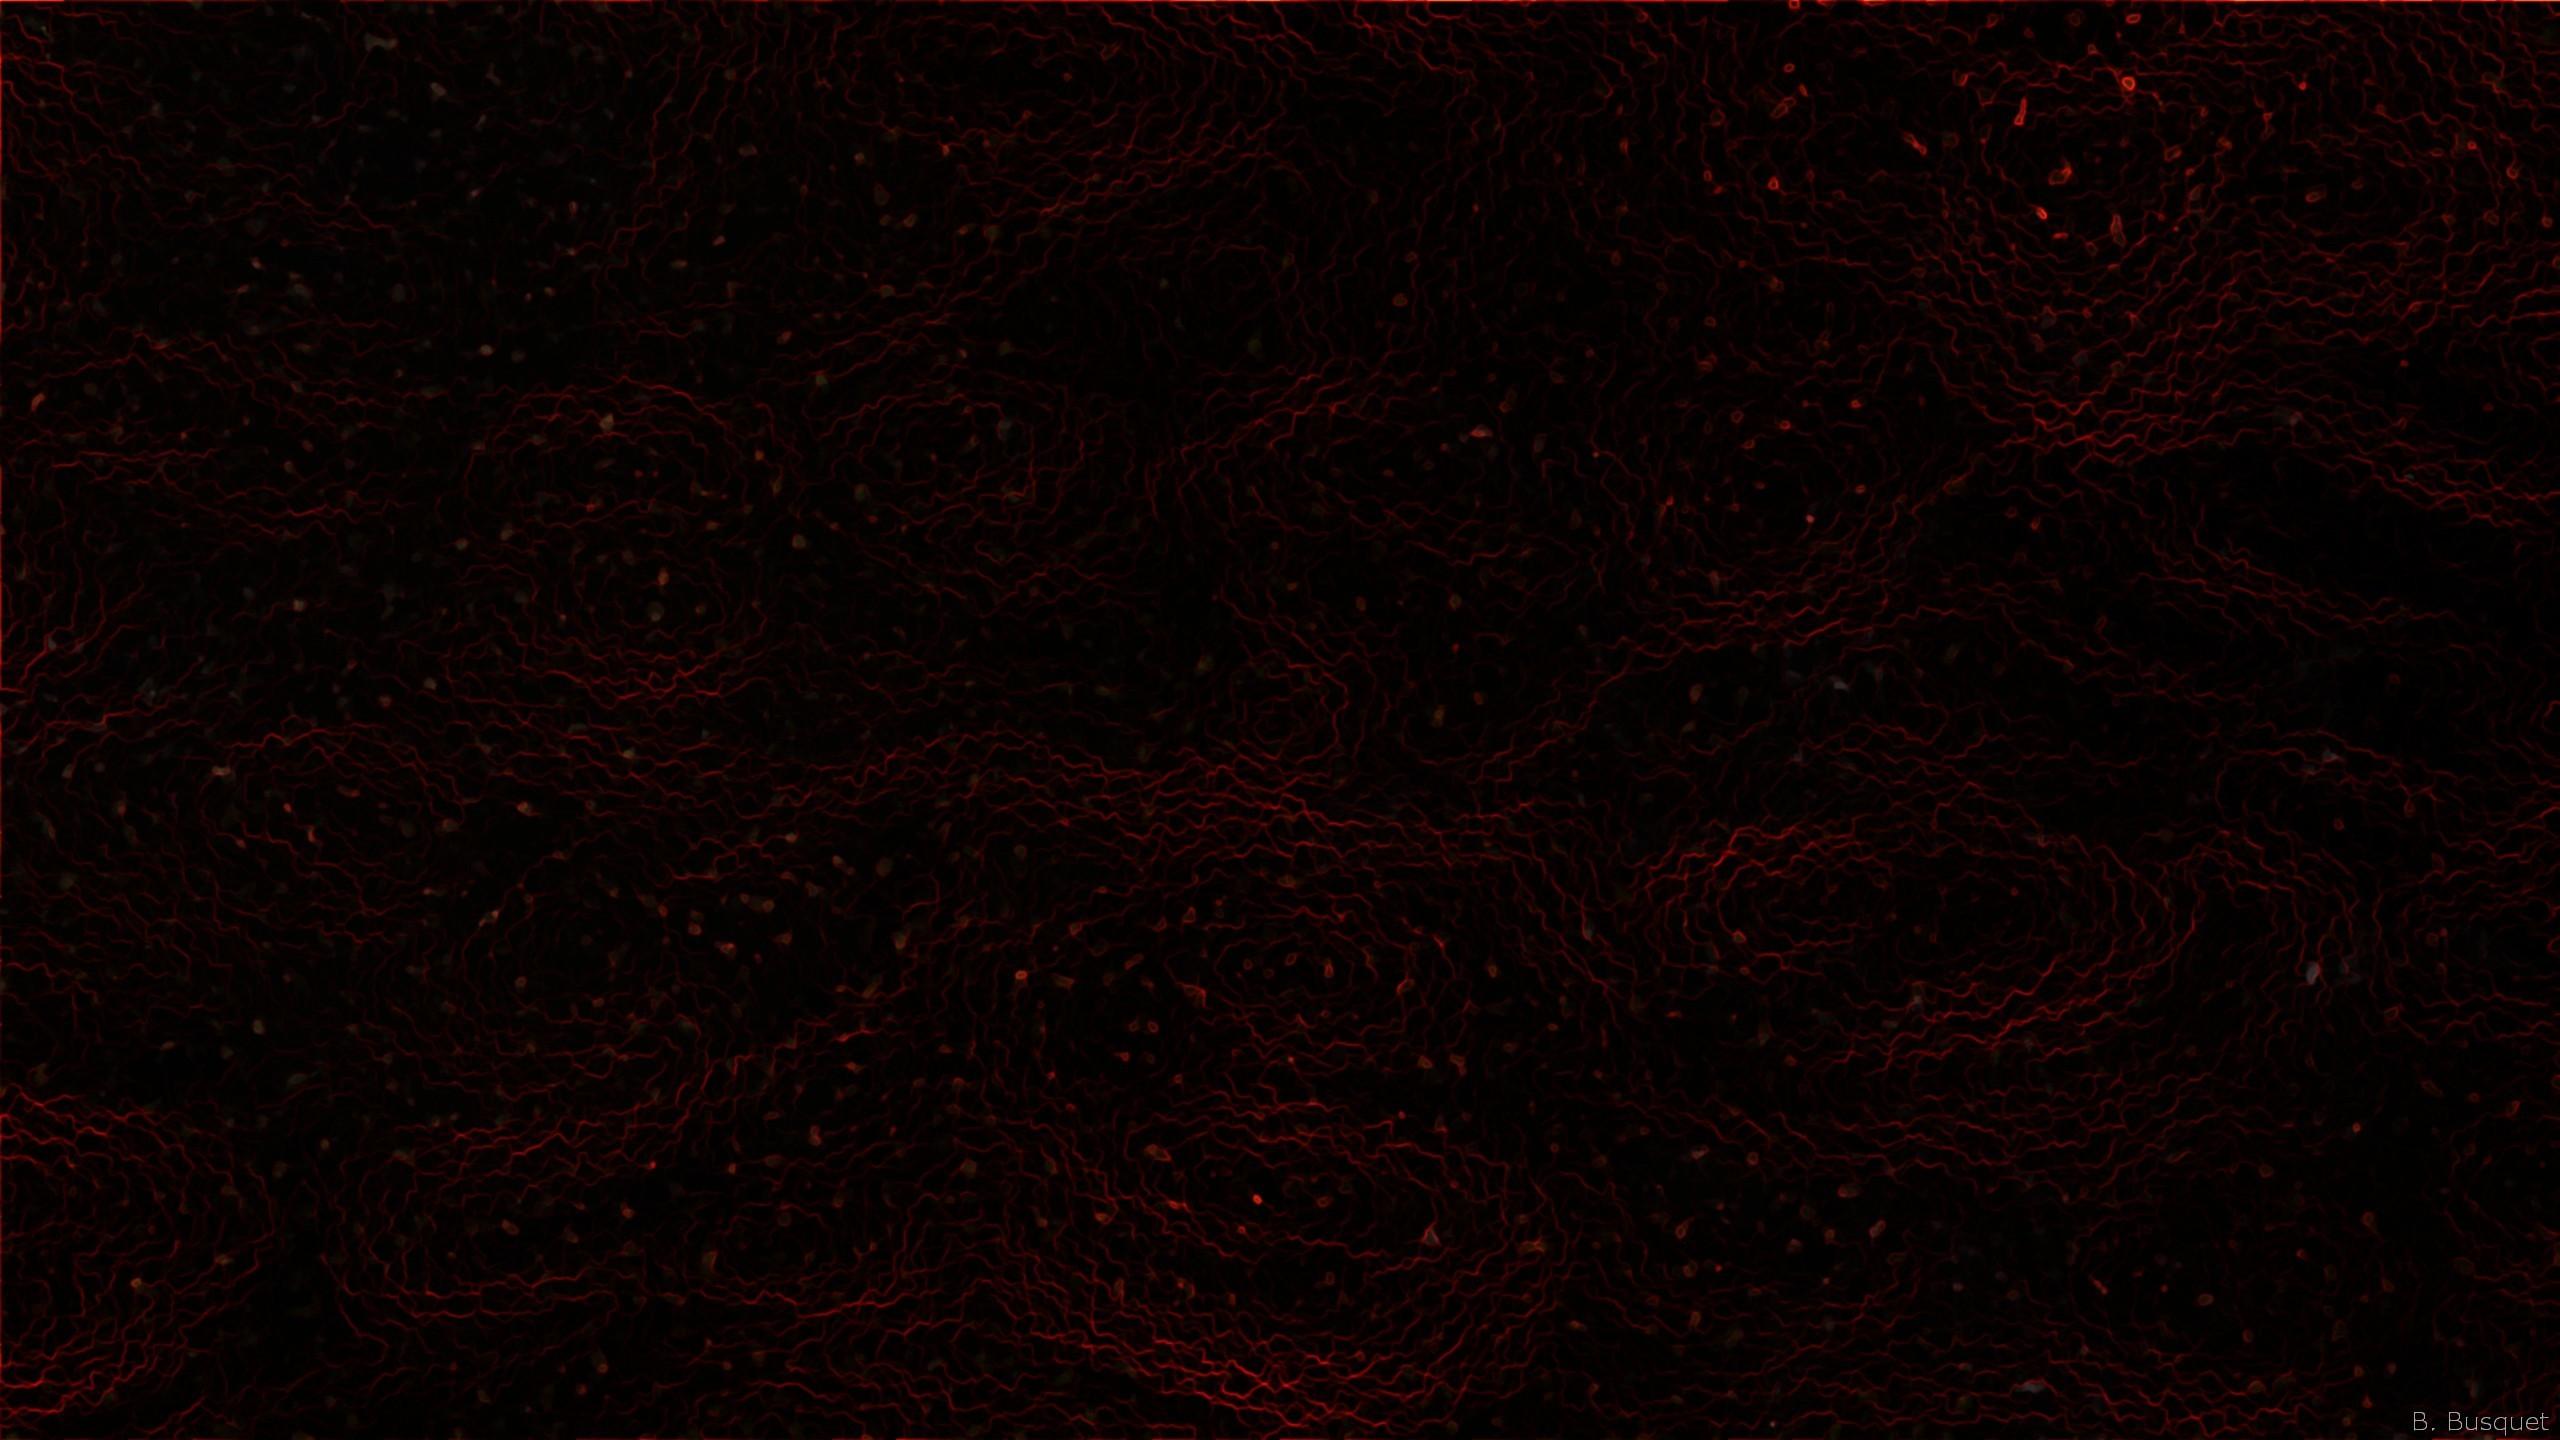 1920x1080 Dark Red Abstract Photo HD Wallpaper Desktop